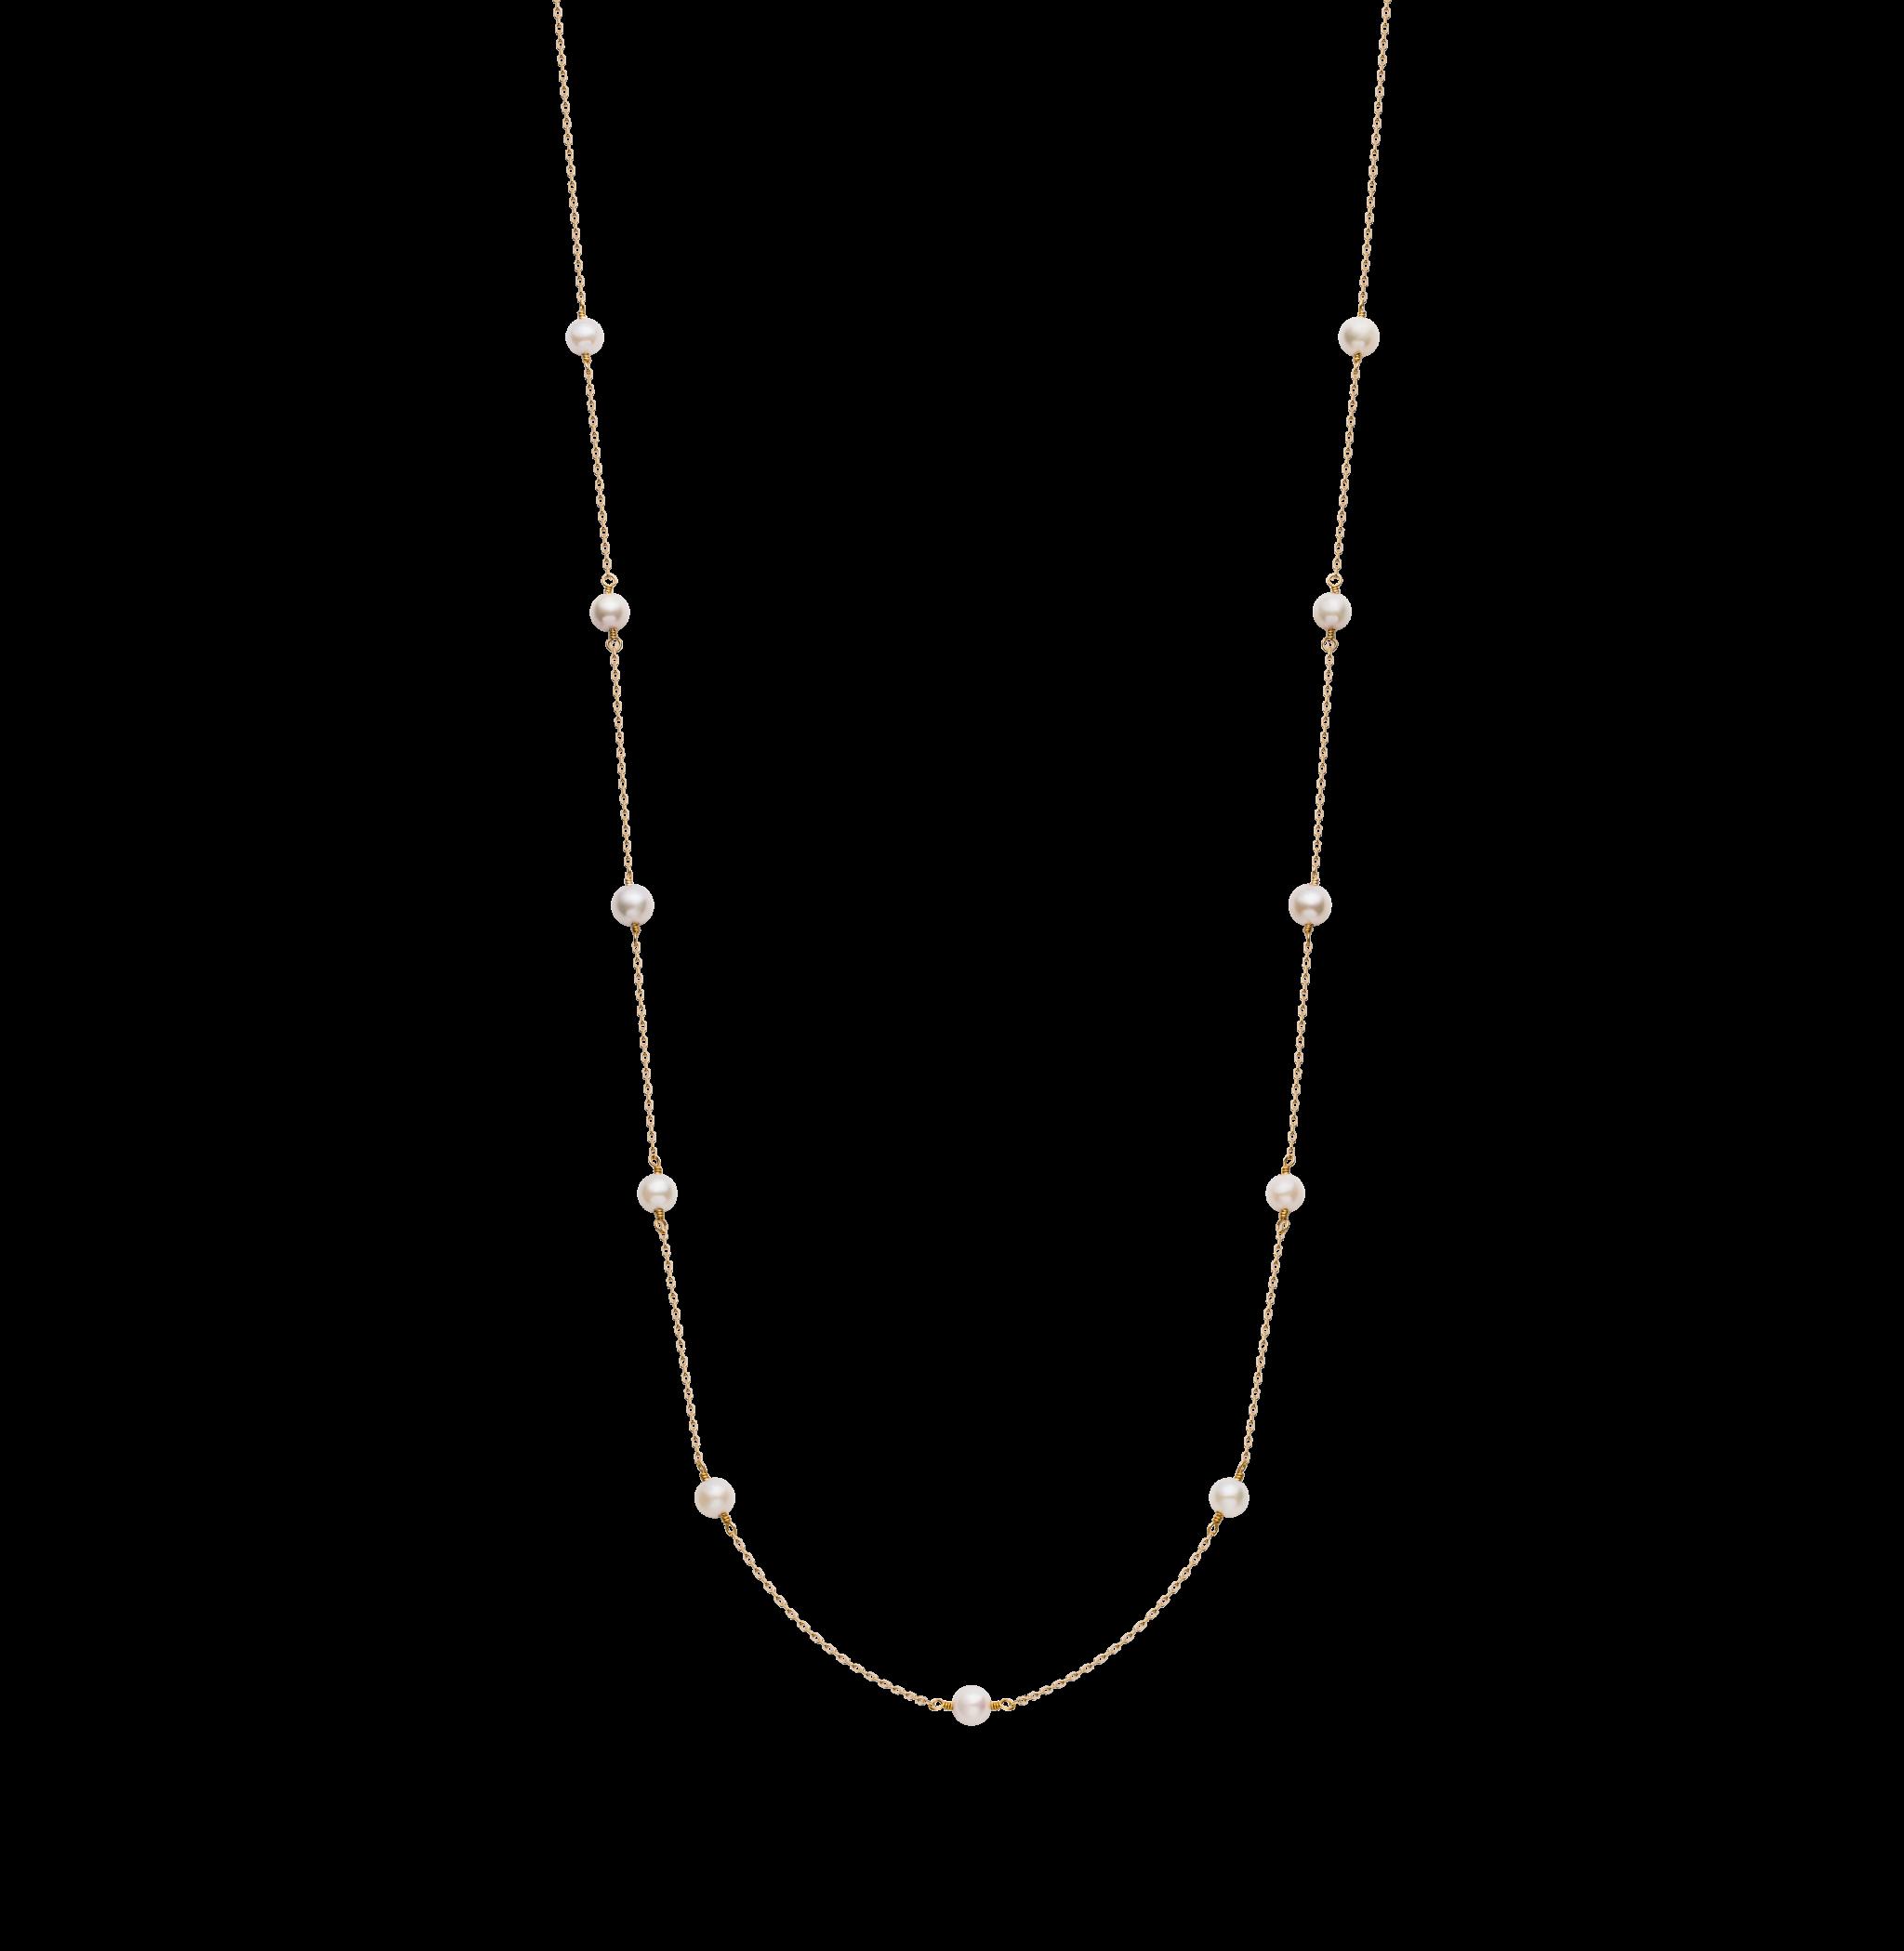 Spuma Collection 9K黄金Akoya珍珠 长链 1699